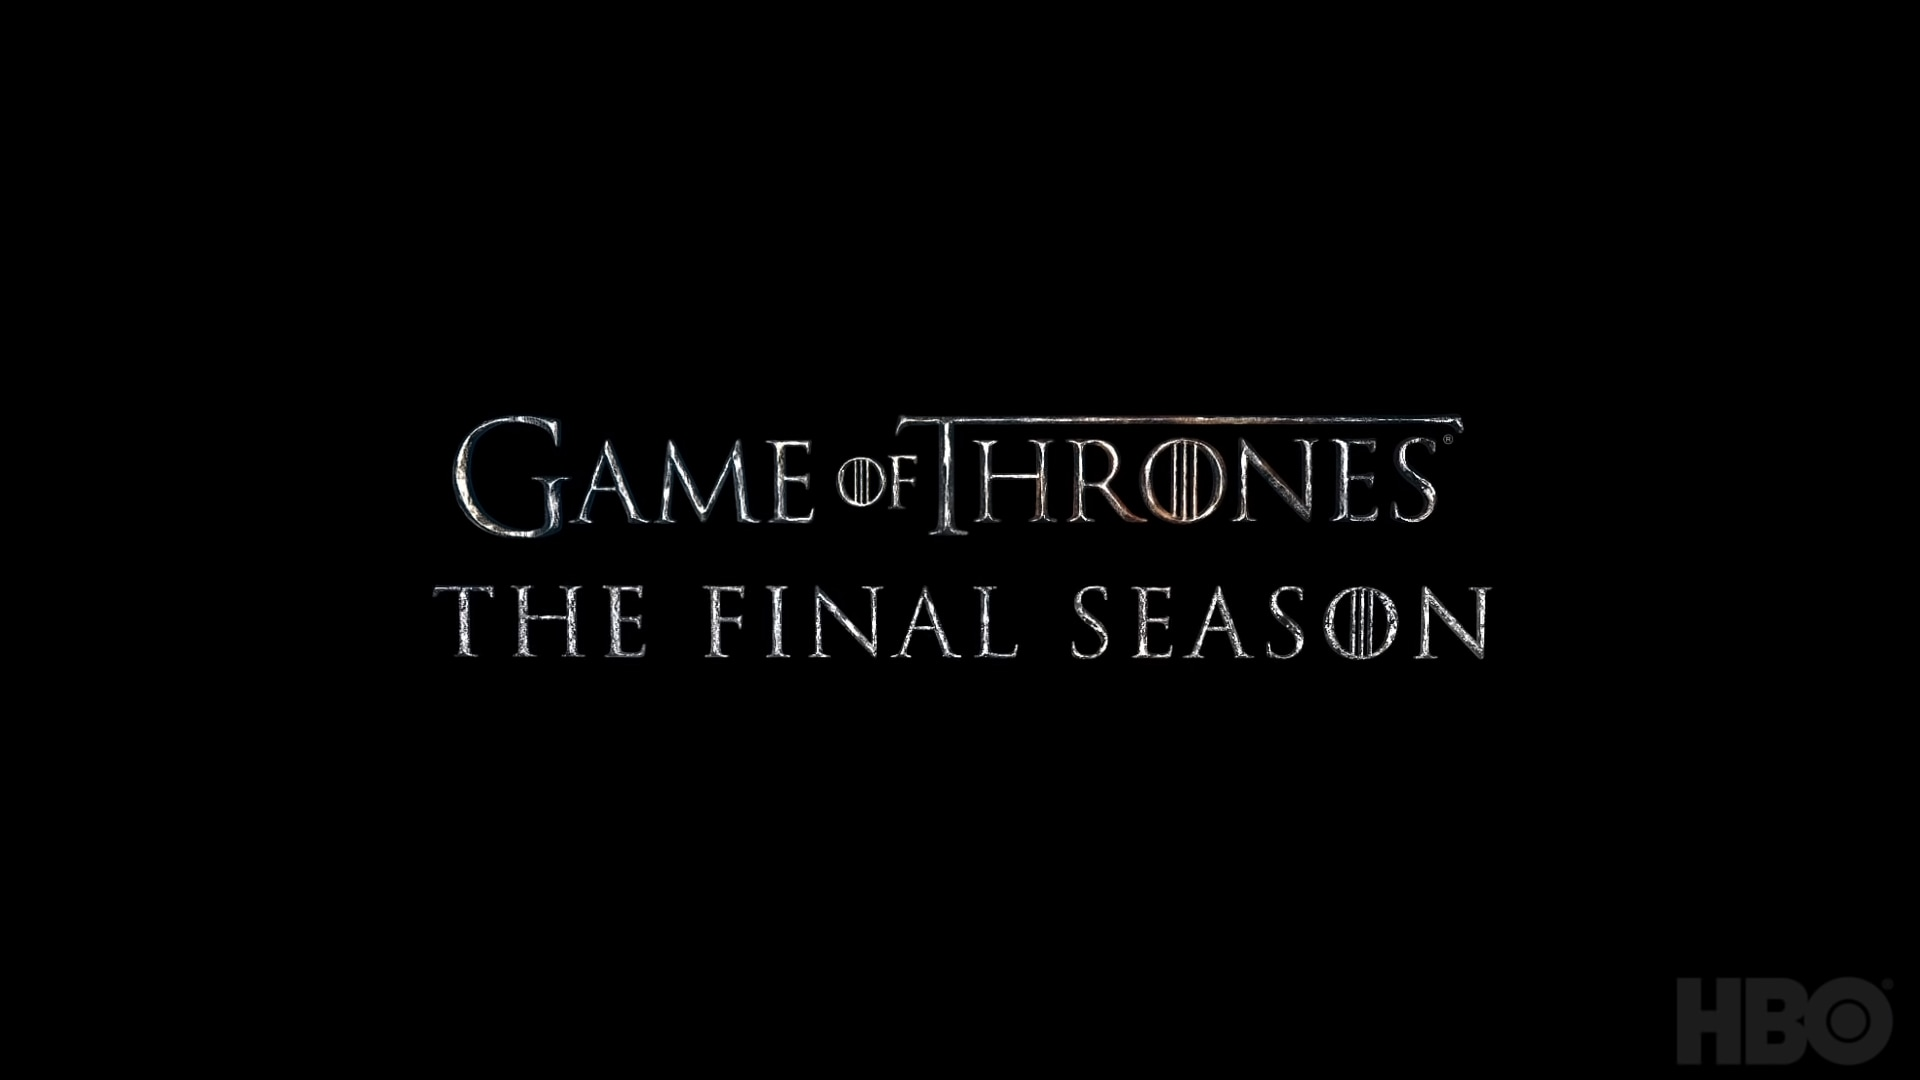 Game of Thrones _ Season 8 _ Official Trailer (HBO) 1-44 screenshot